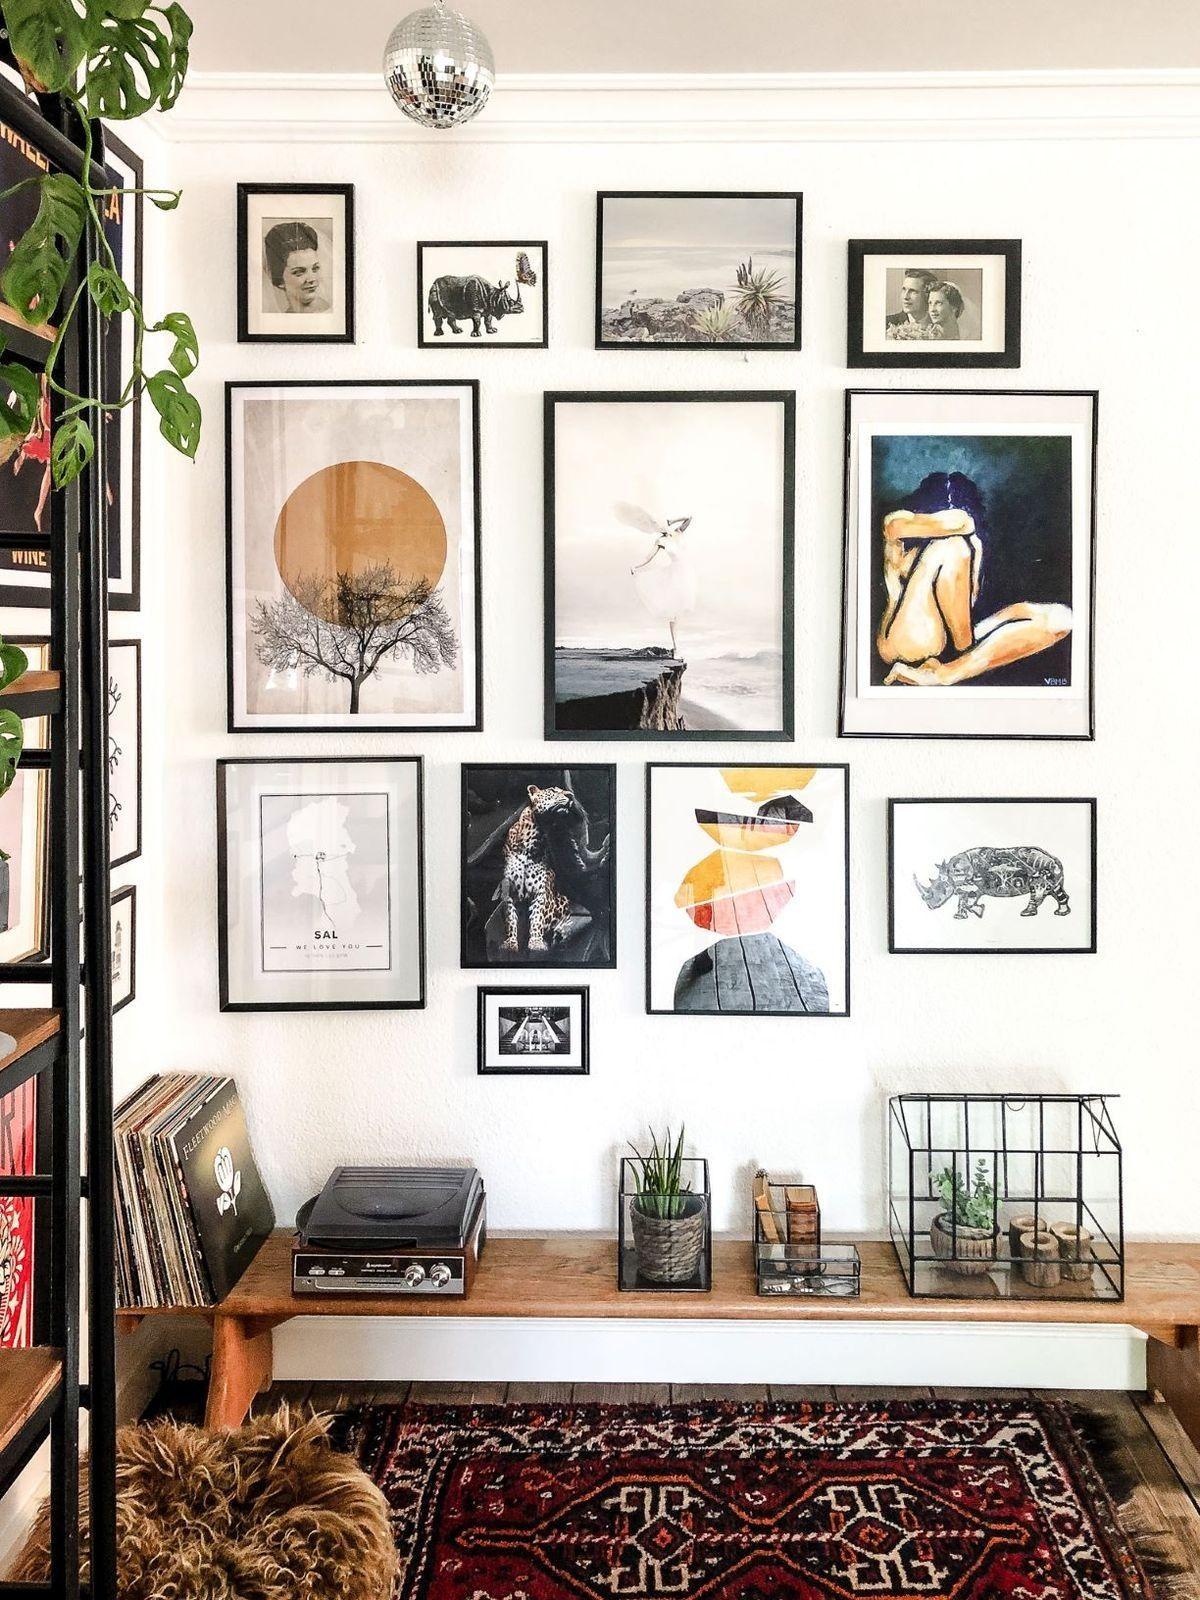 Beautiful Boho Gallery Walls Gallery Wall Decor Decor Gallery Wall Inspiration